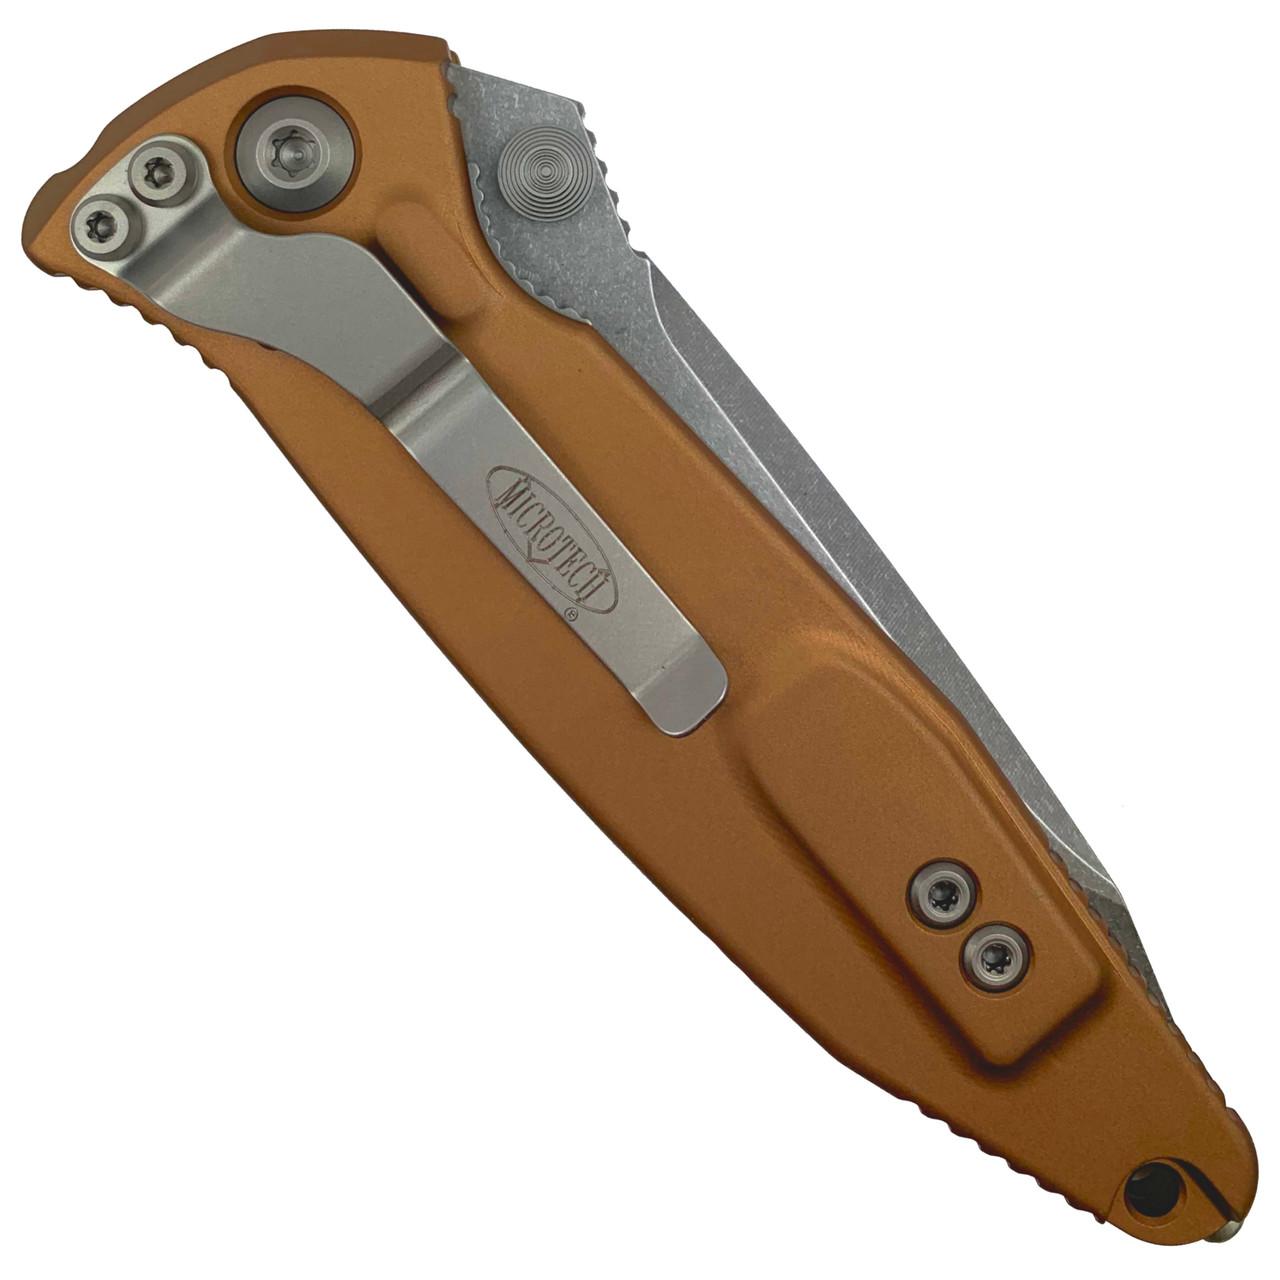 Microtech Tan Socom Elite Tanto Folder Knife, Stonewash Blade REAR VIEW